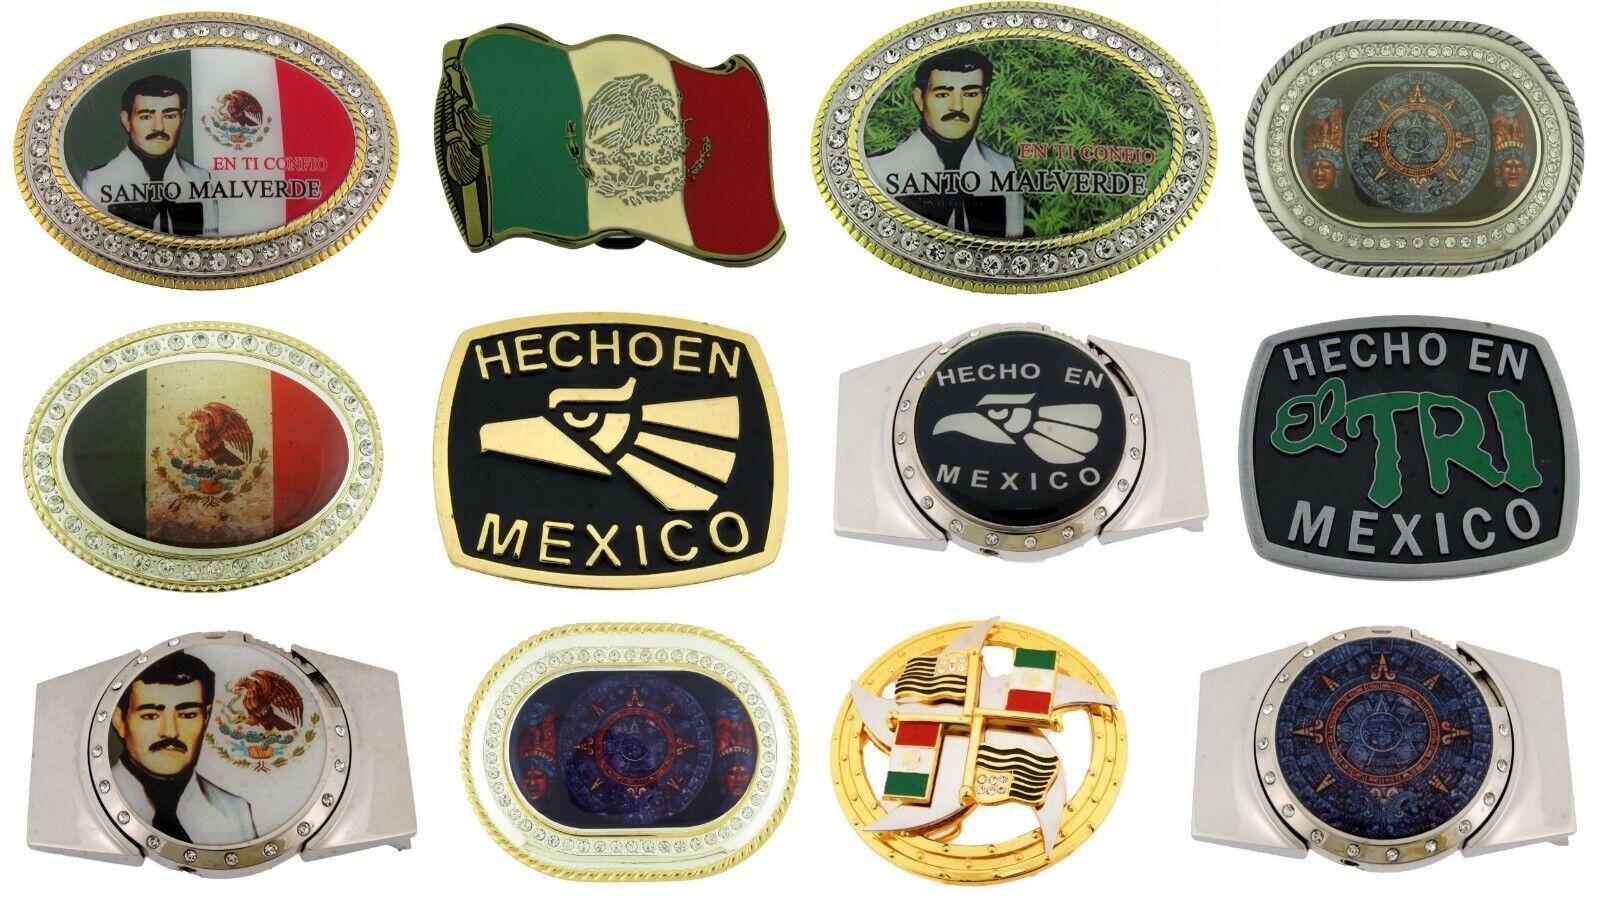 12 Stück Mexikanisch Azteca Kalender Hecho Mexico Malverde Gürtel Anzünder Metal